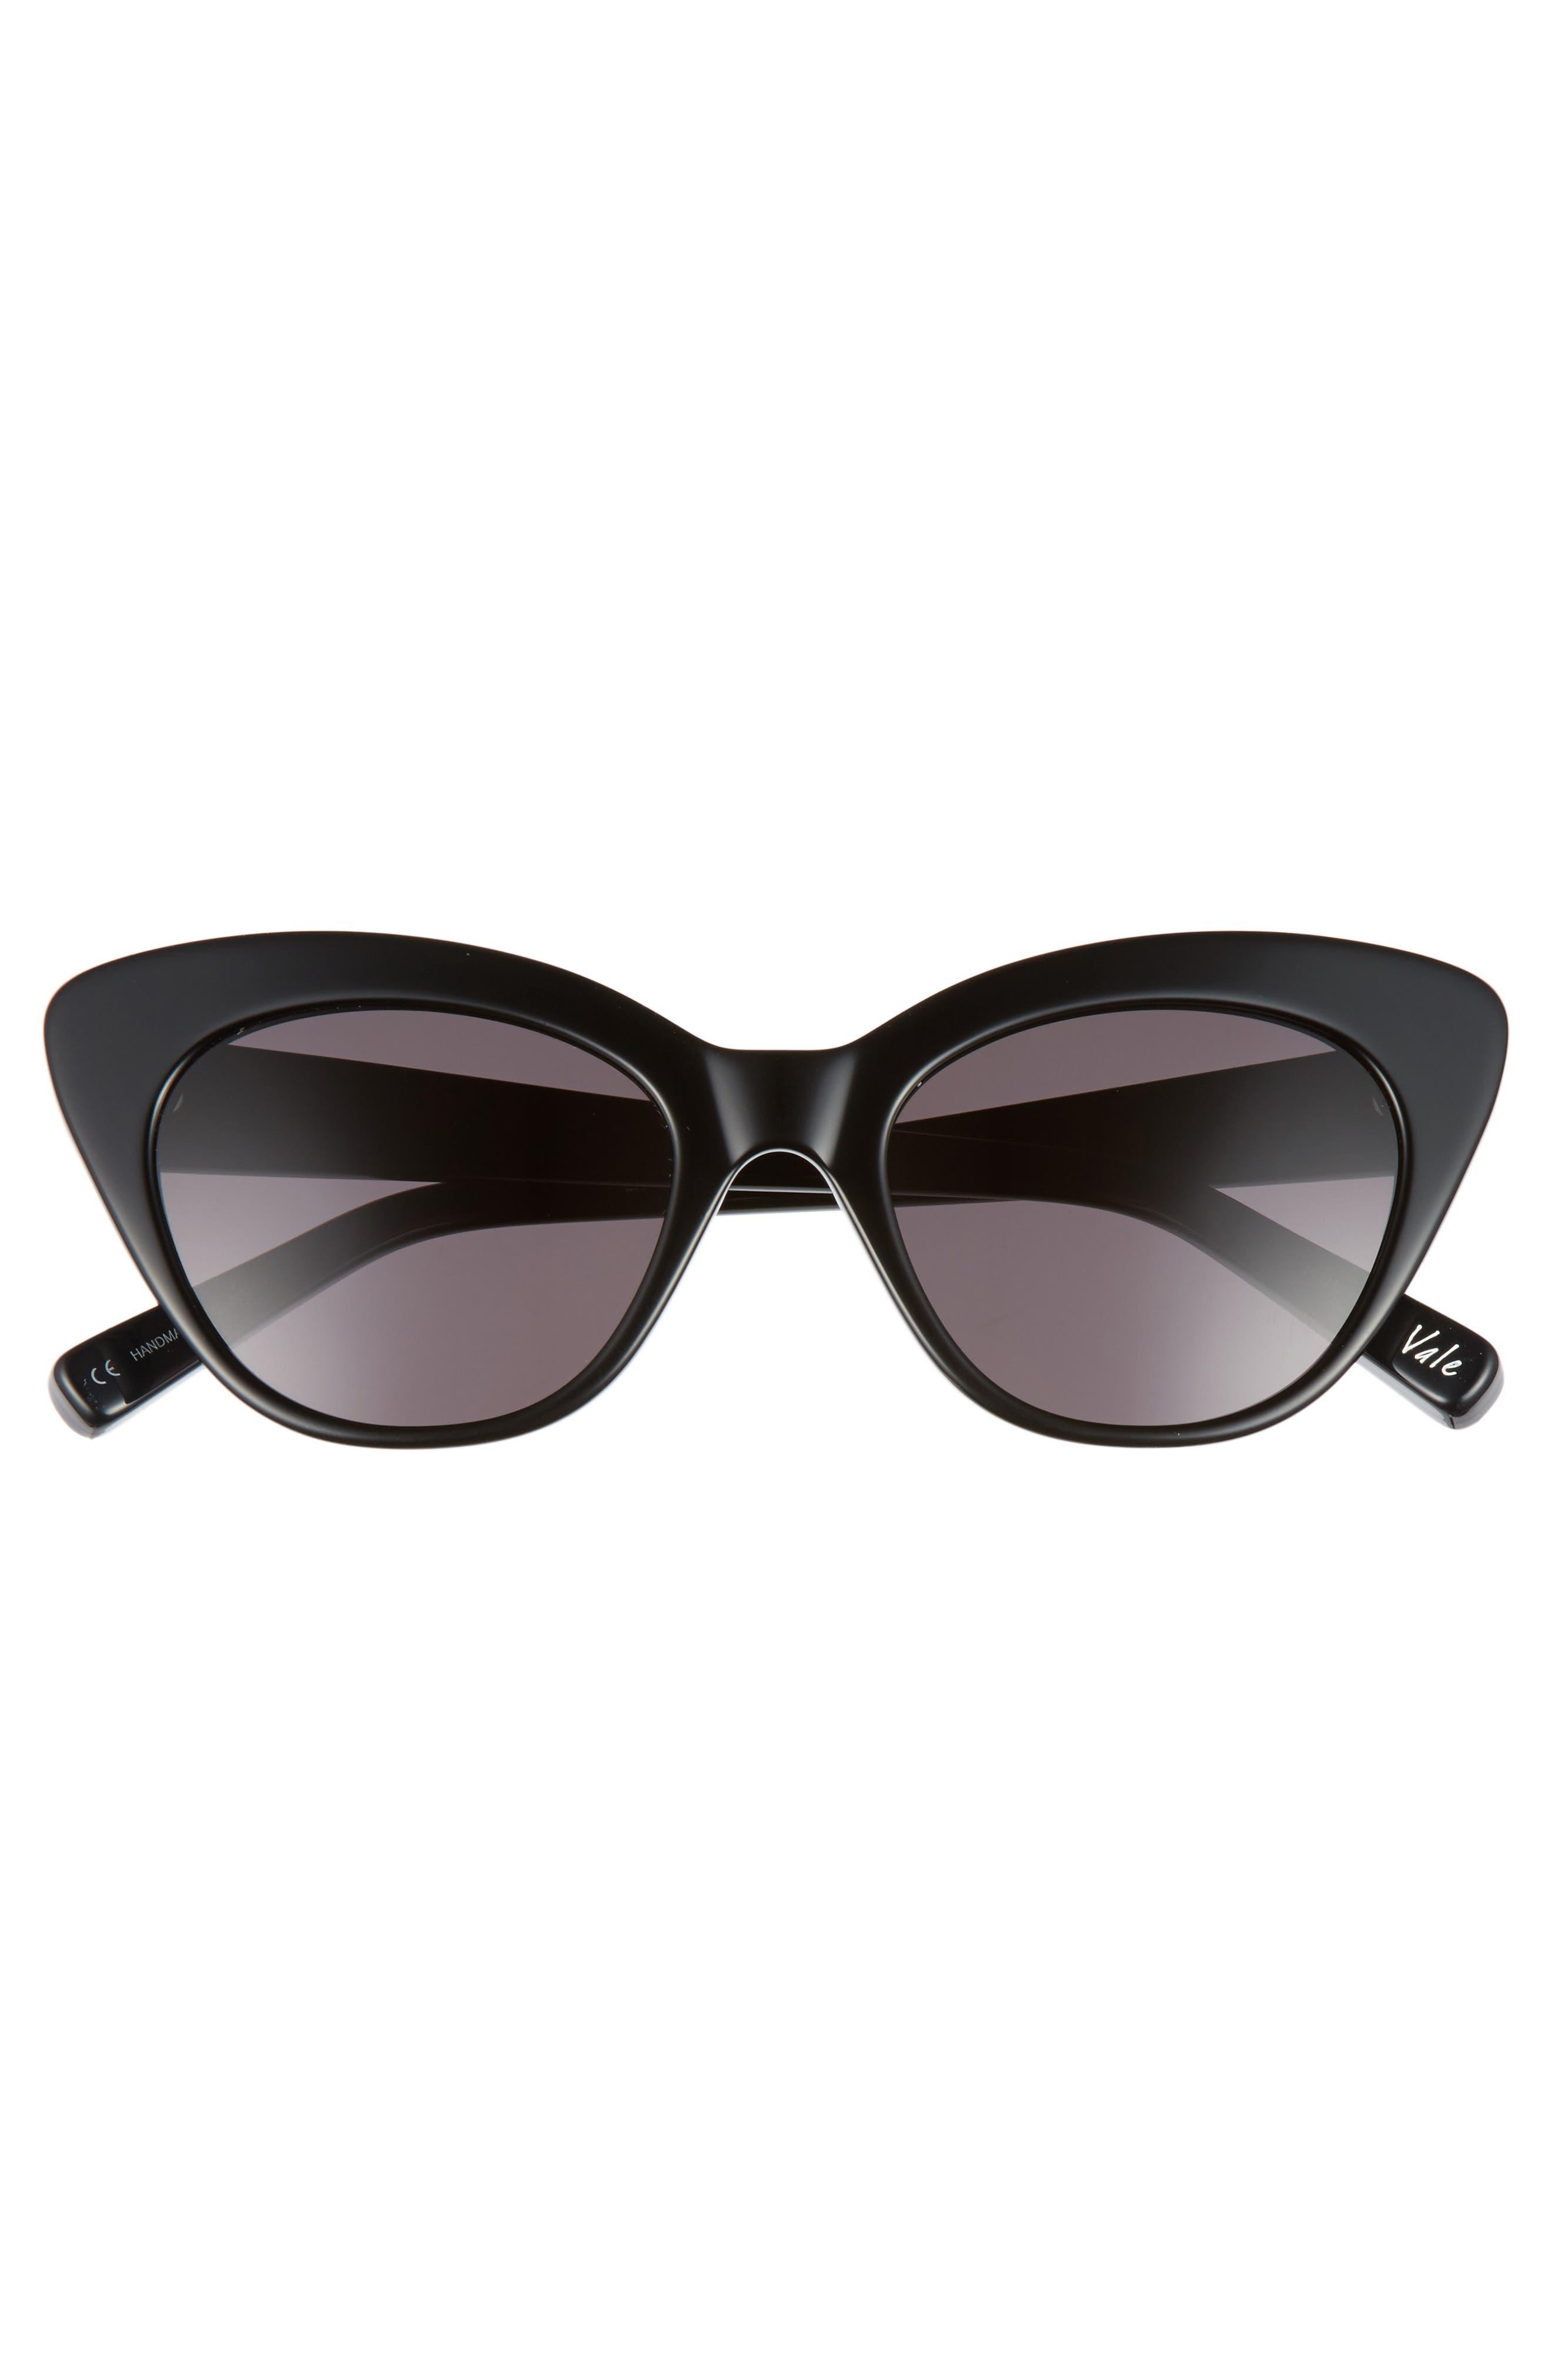 ELIZABETH AND JAMES, Vale 52mm Cat Eye Sunglasses, Alternate thumbnail 3, color, 020